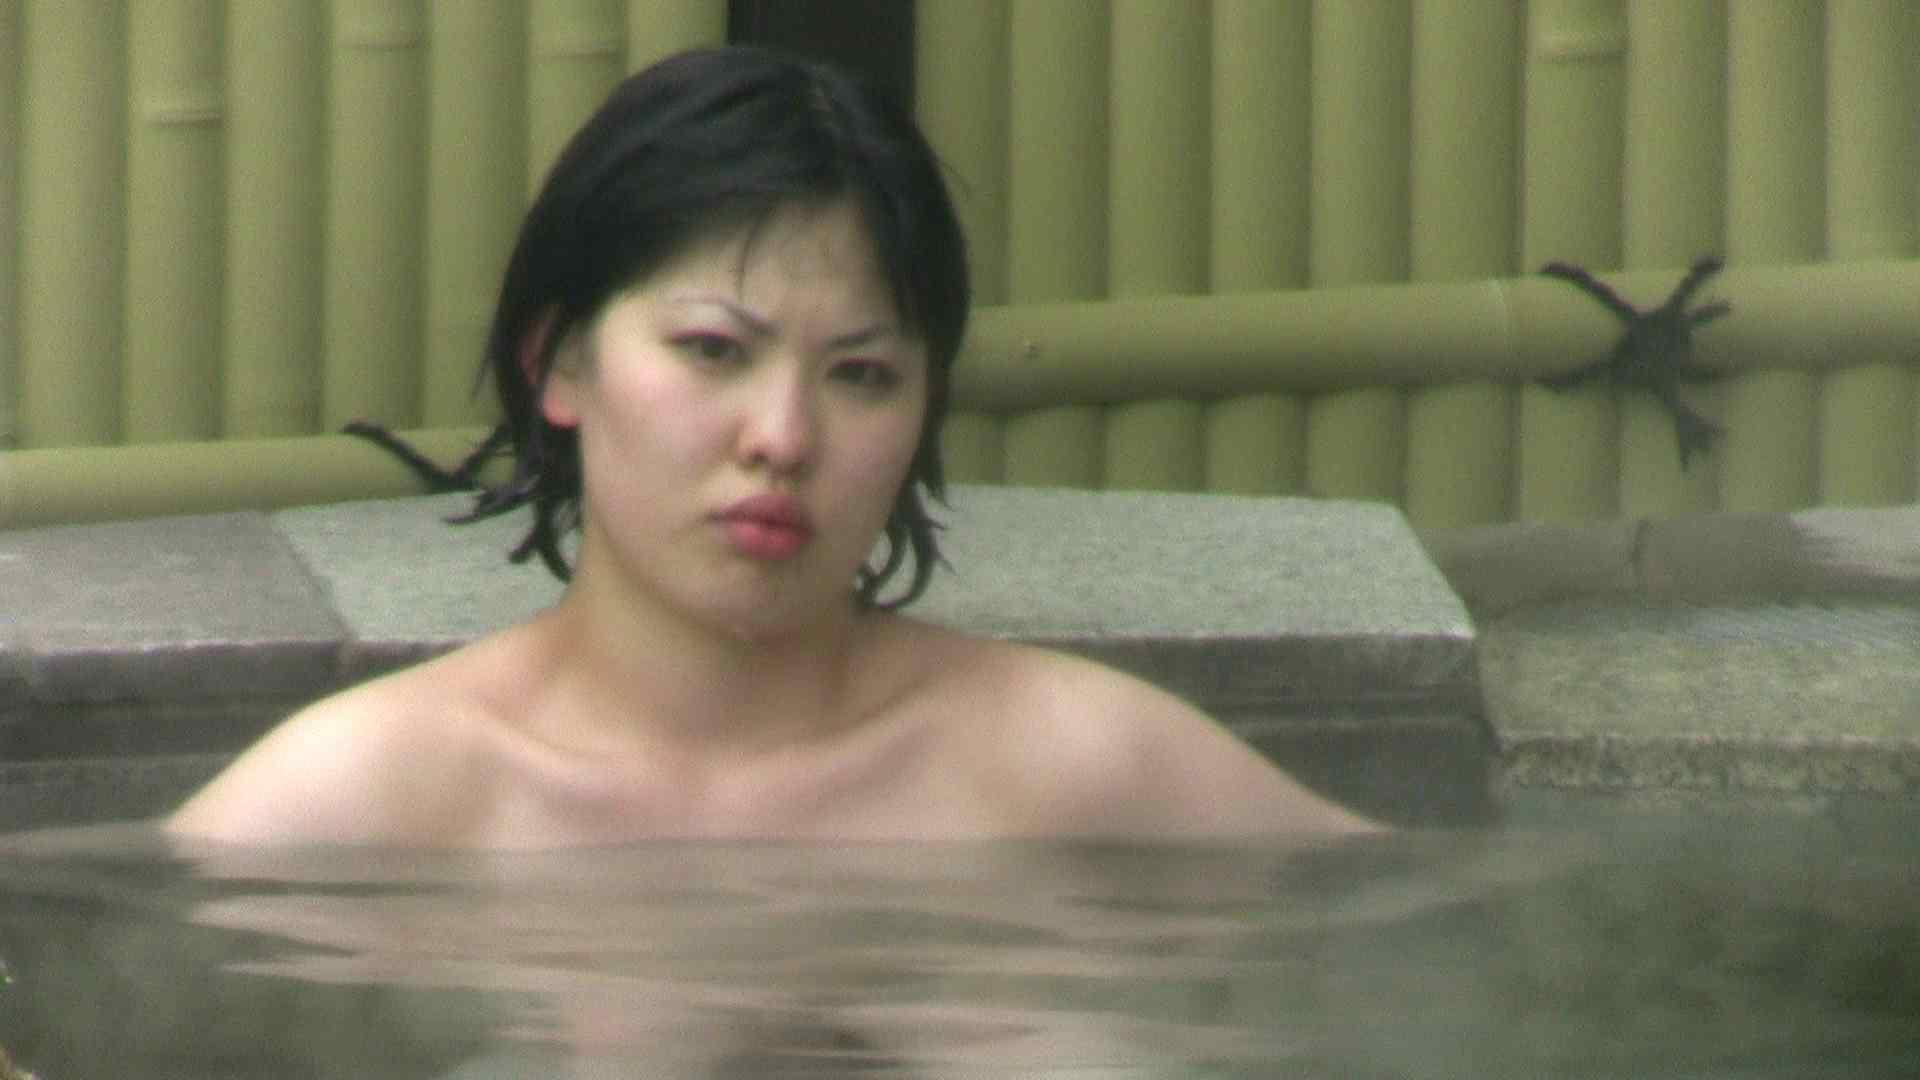 Aquaな露天風呂Vol.114 盗撮映像  72Pix 20